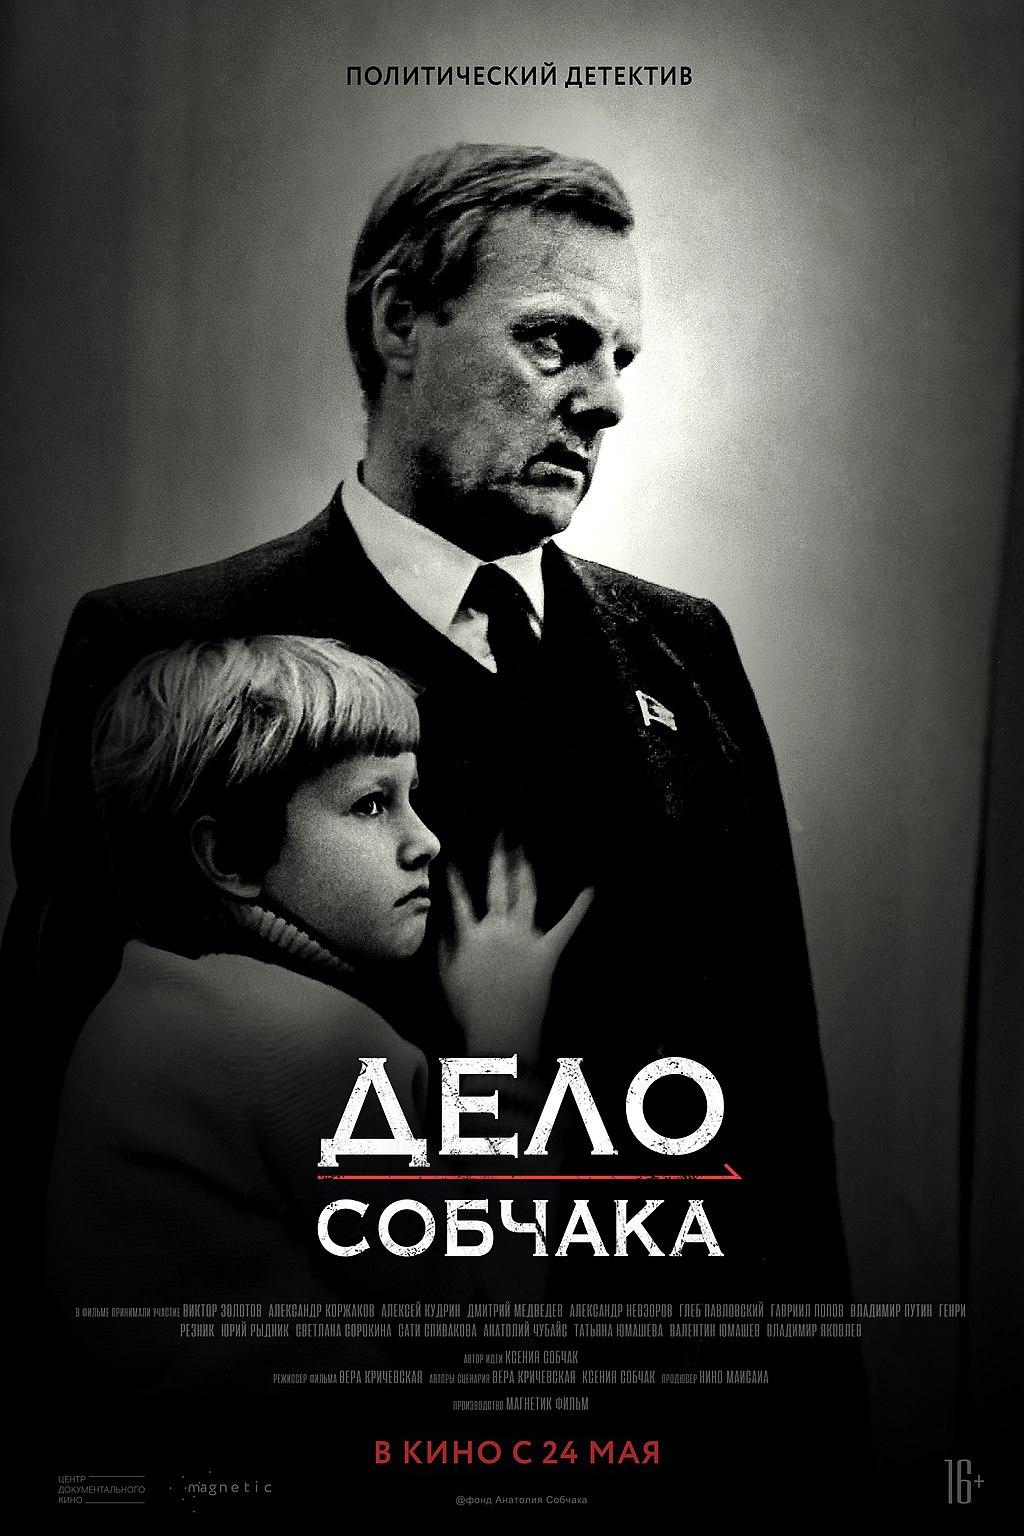 Ksenia Sobchak showed her love triangle 06/19/2011 26